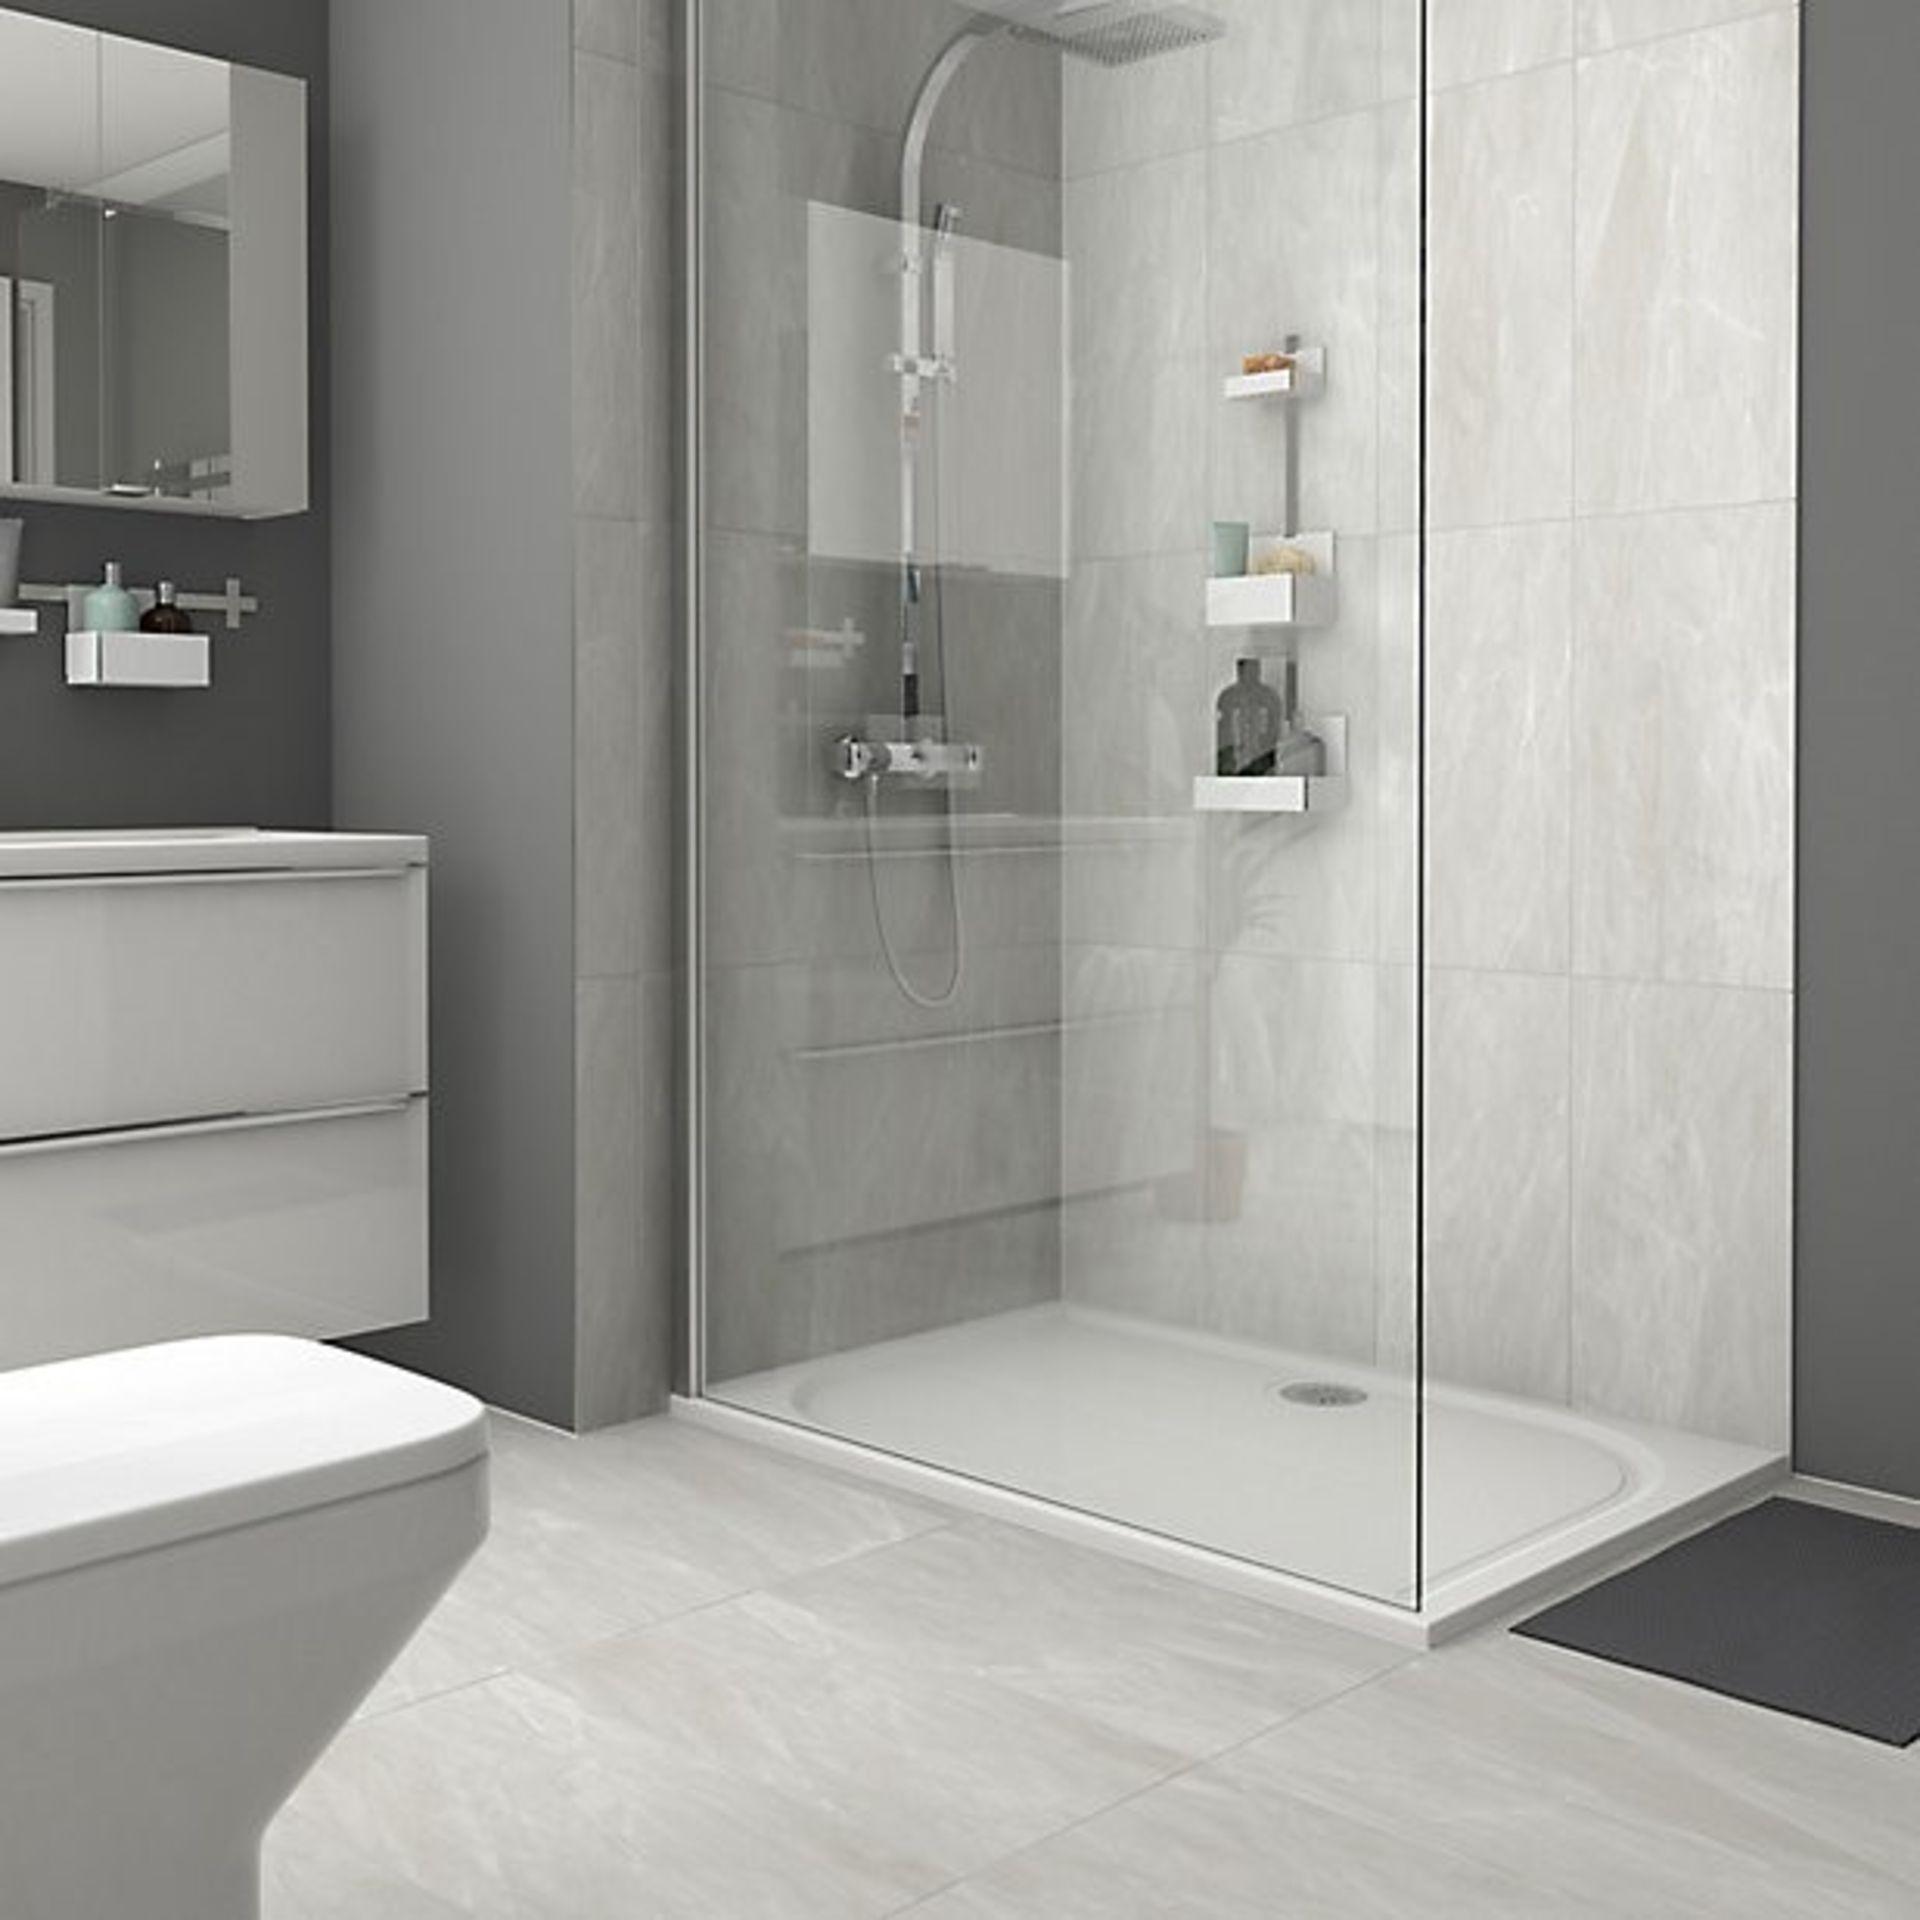 NEW 30.24m2 Killington Light Grey Matt Marble effect Ceramic Floor tile. Room use: Any room,